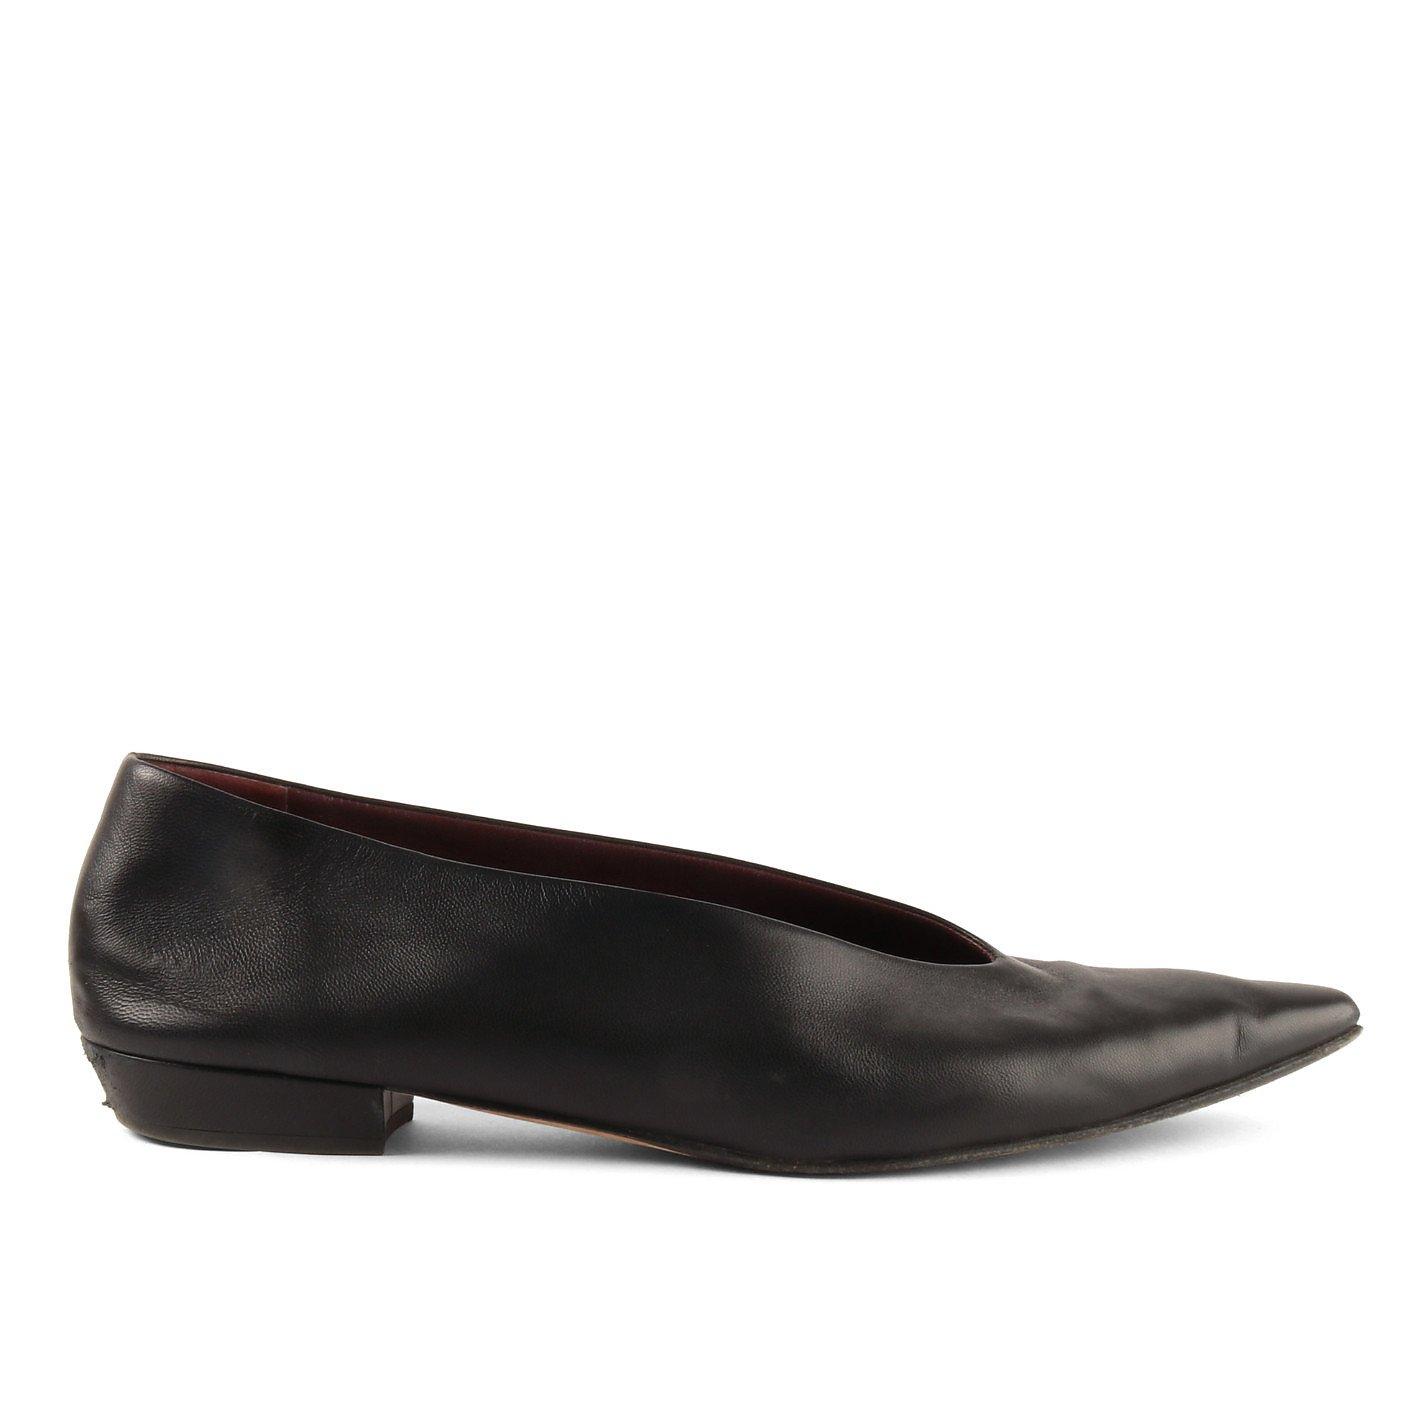 Bottega Veneta High-Vamp Leather Flats